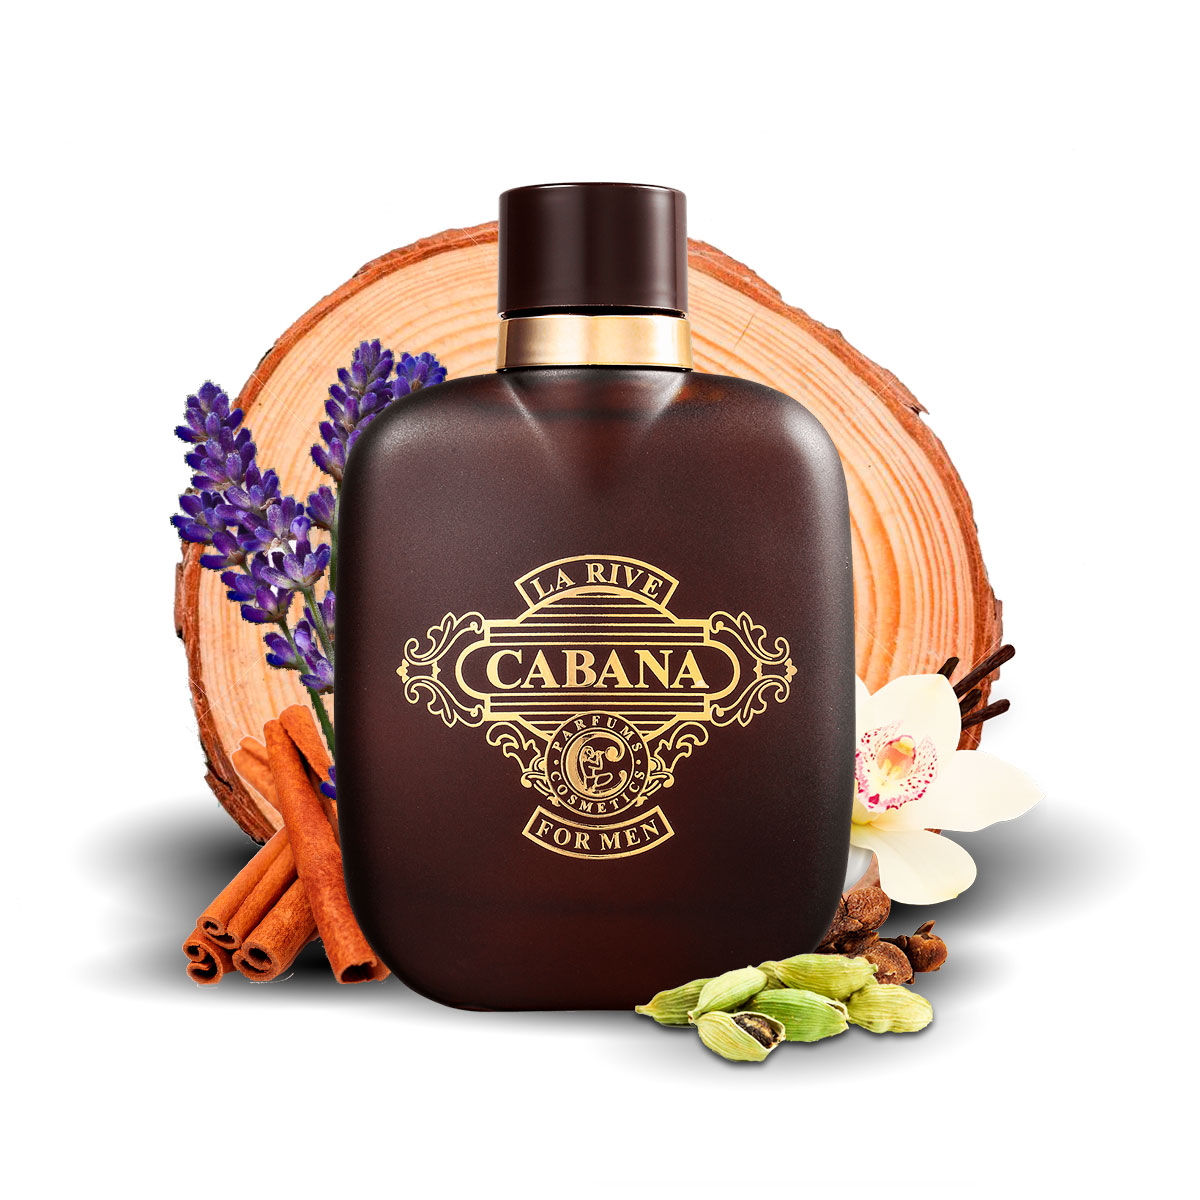 Kit 2 Perfumes Importados In Flames e Cabana La Rive